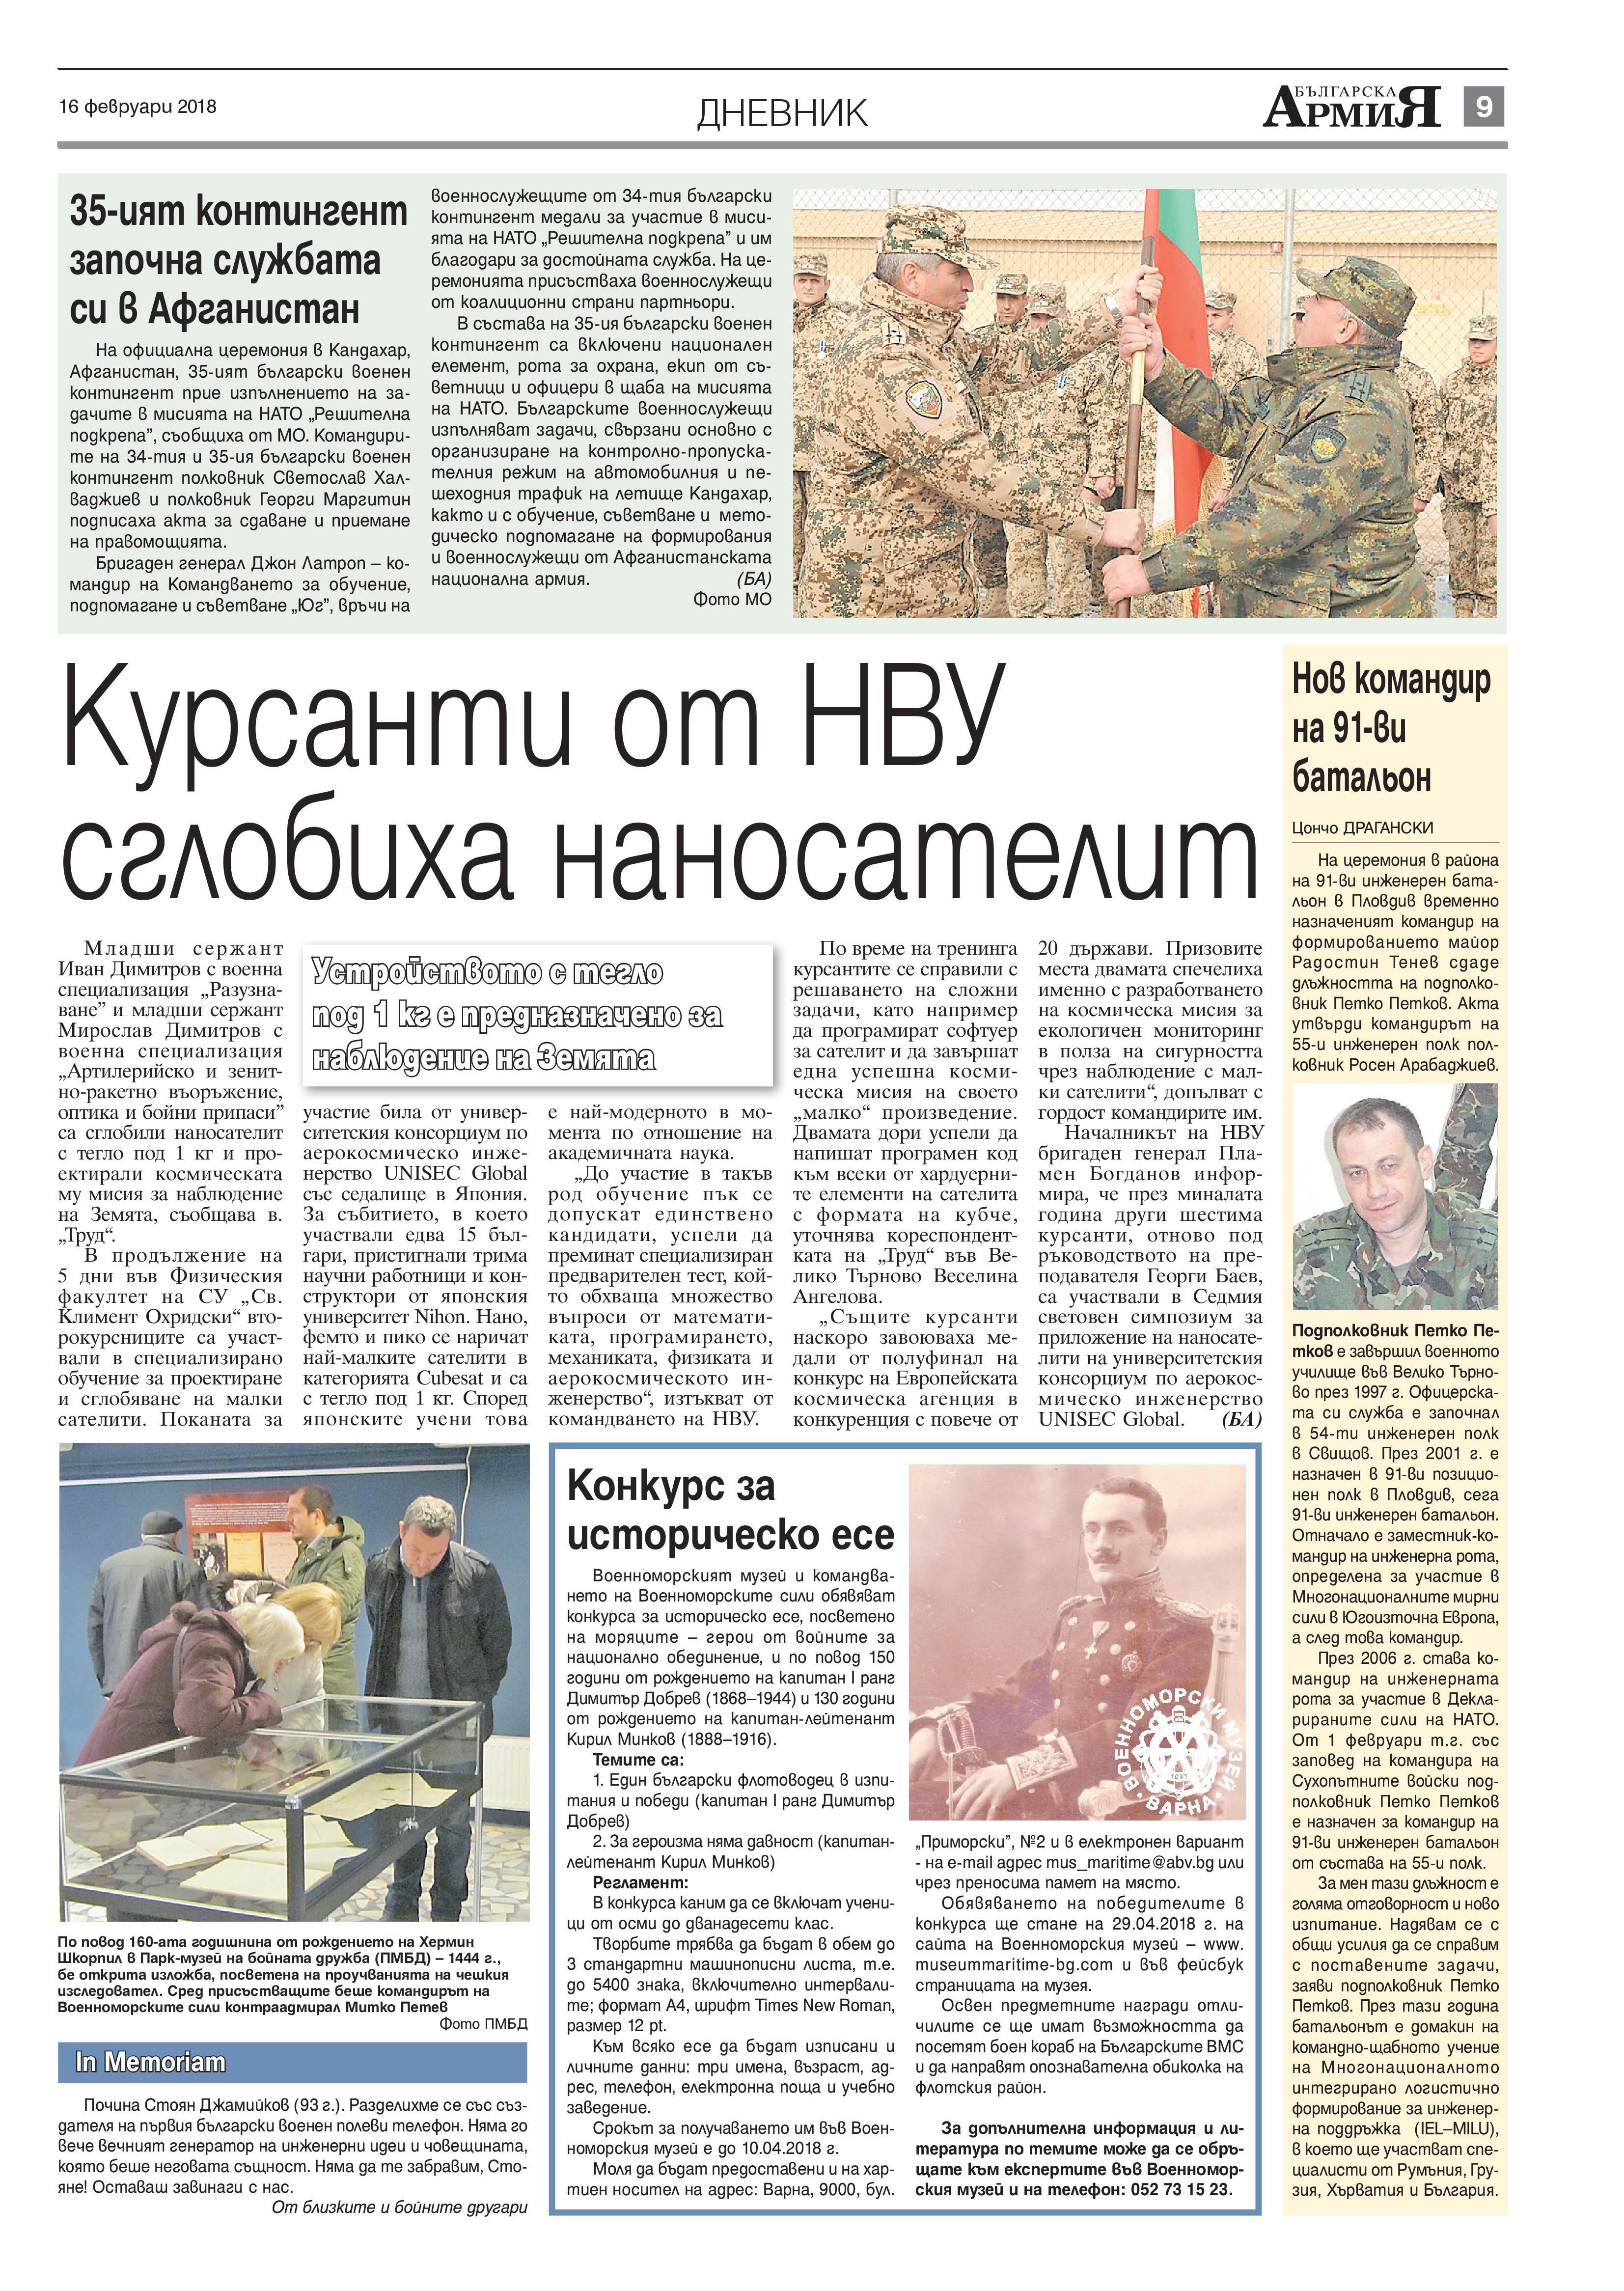 http://armymedia.bg/wp-content/uploads/2015/06/09-19.jpg